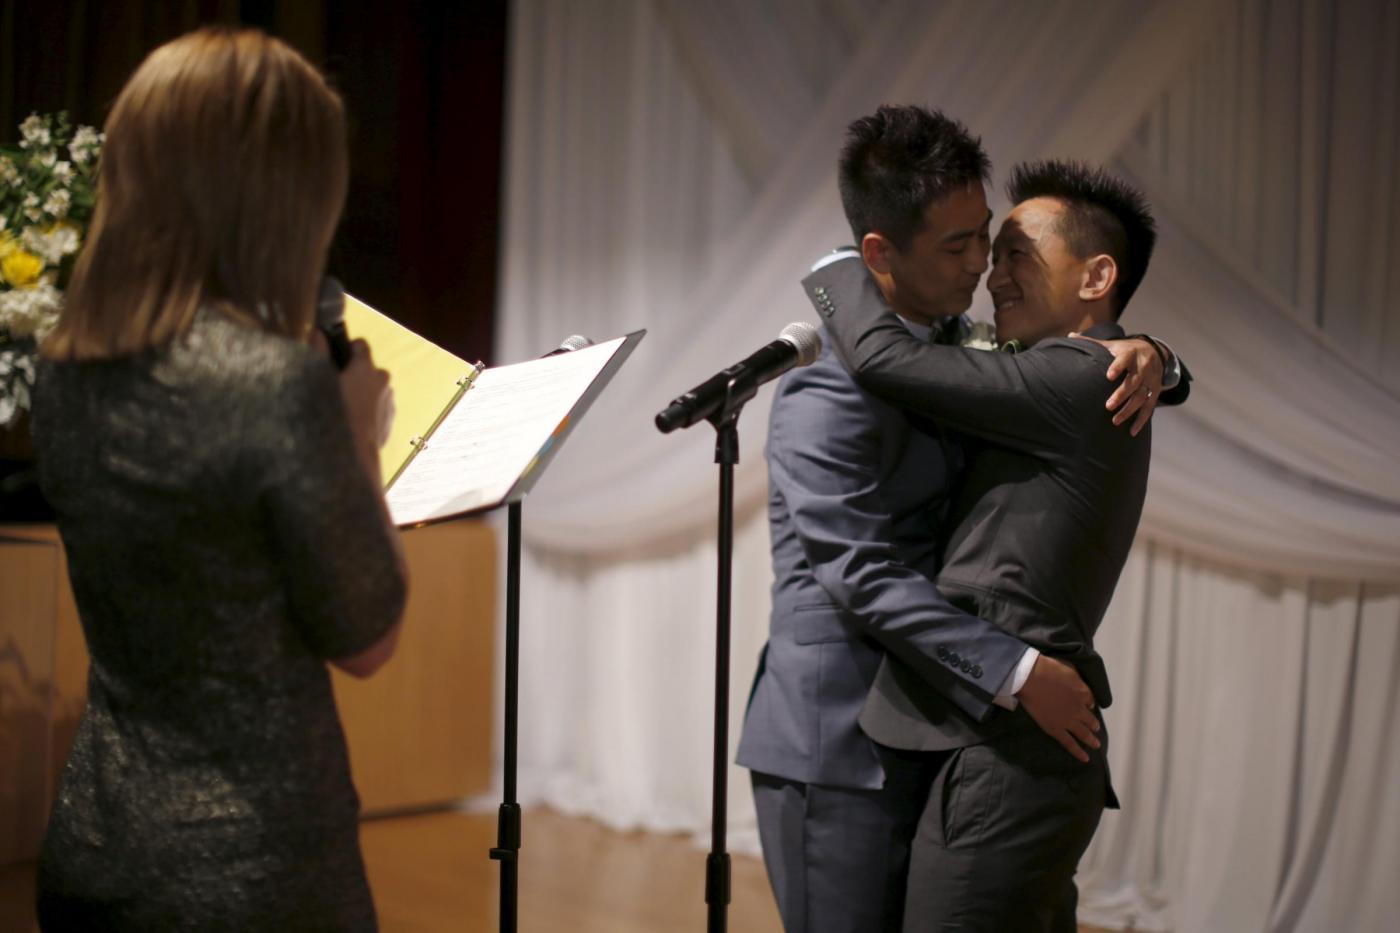 Sette coppie omosessuali cinesi si sposano a Los Angeles14